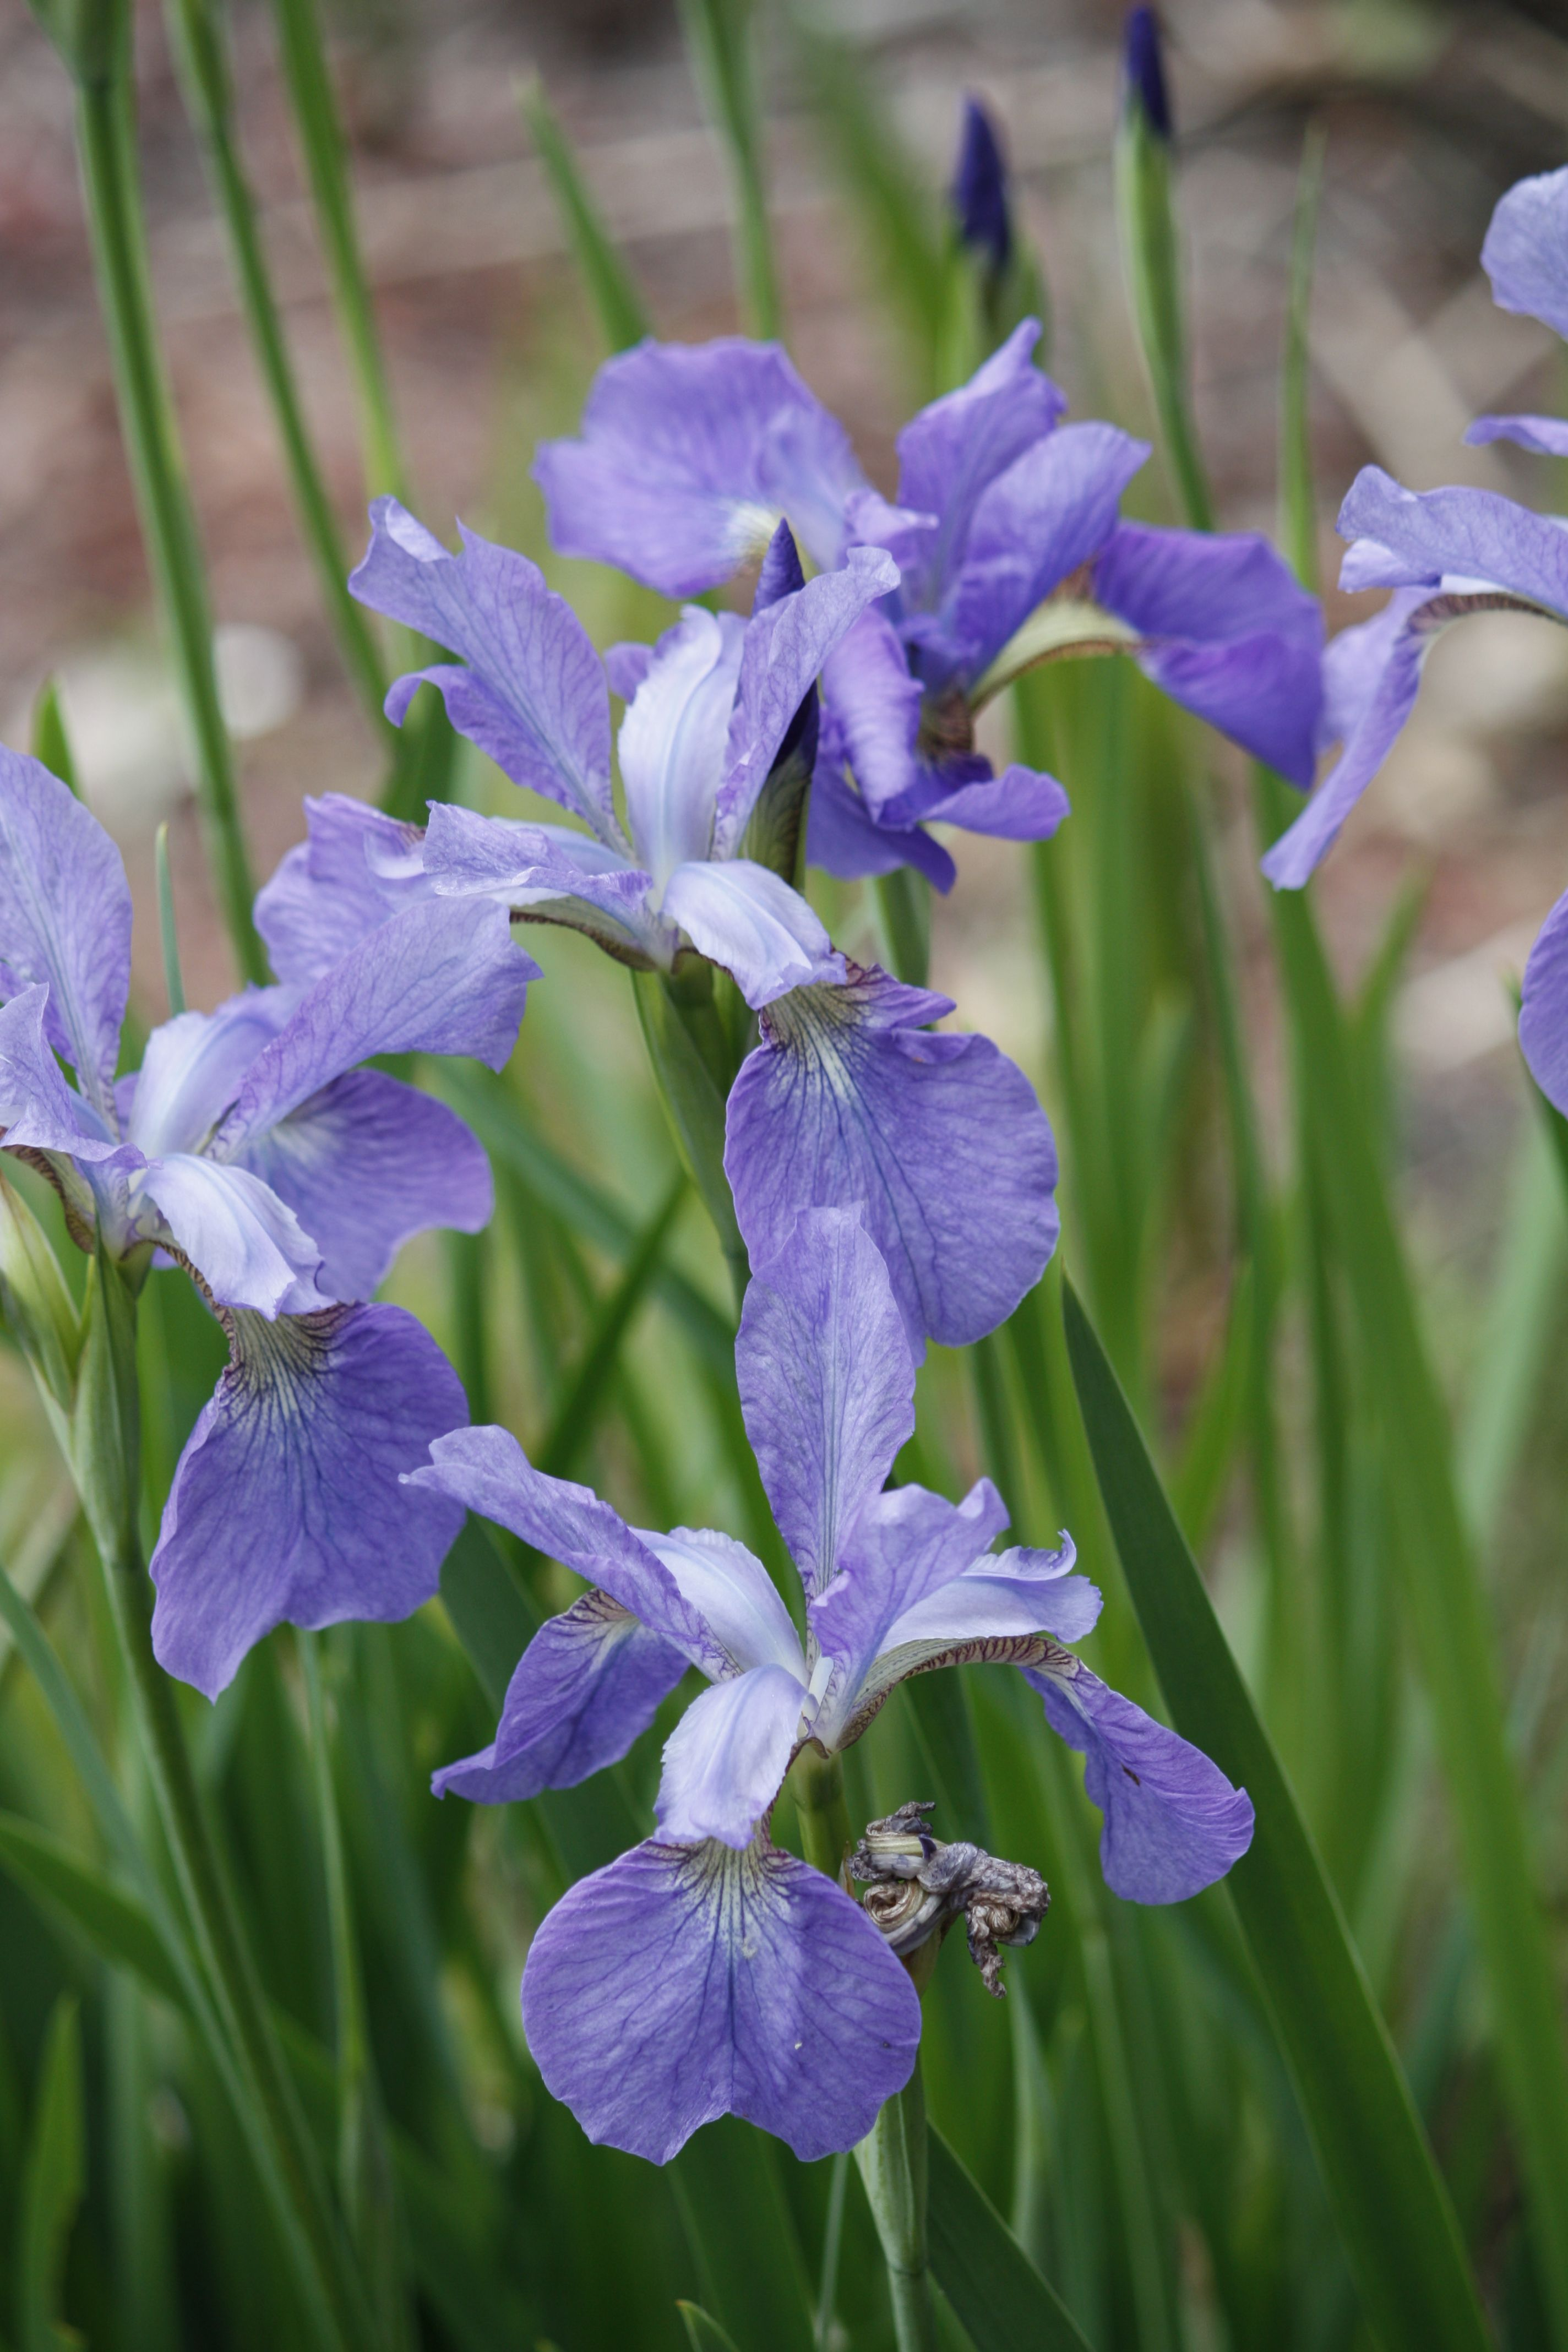 Perennial Flower Purple Iris Sally Summerfield My Photography